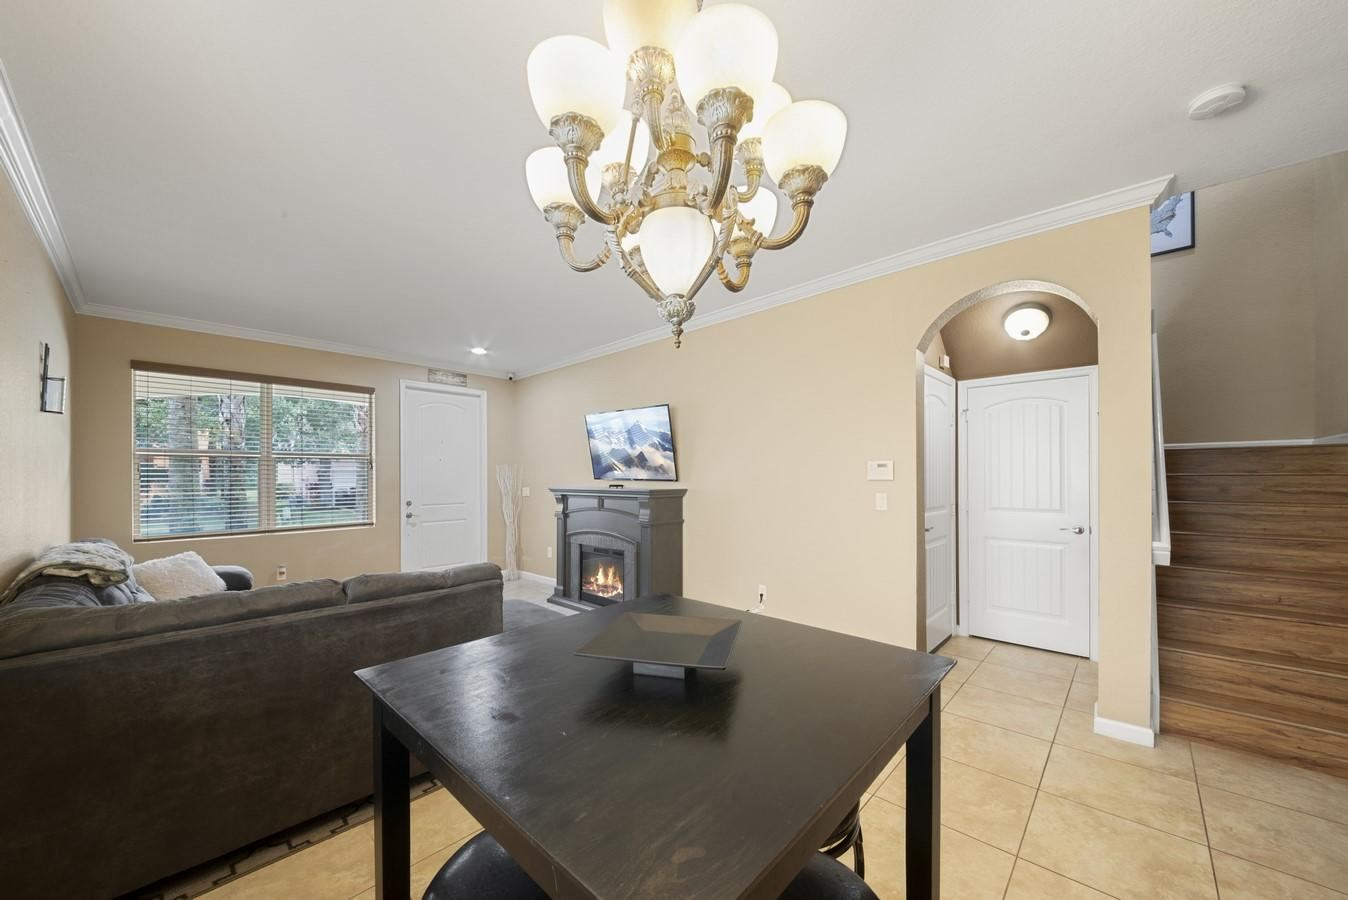 142 Two Pine Drive, Greenacres, FL 33413 - MLS#: RX-10729682